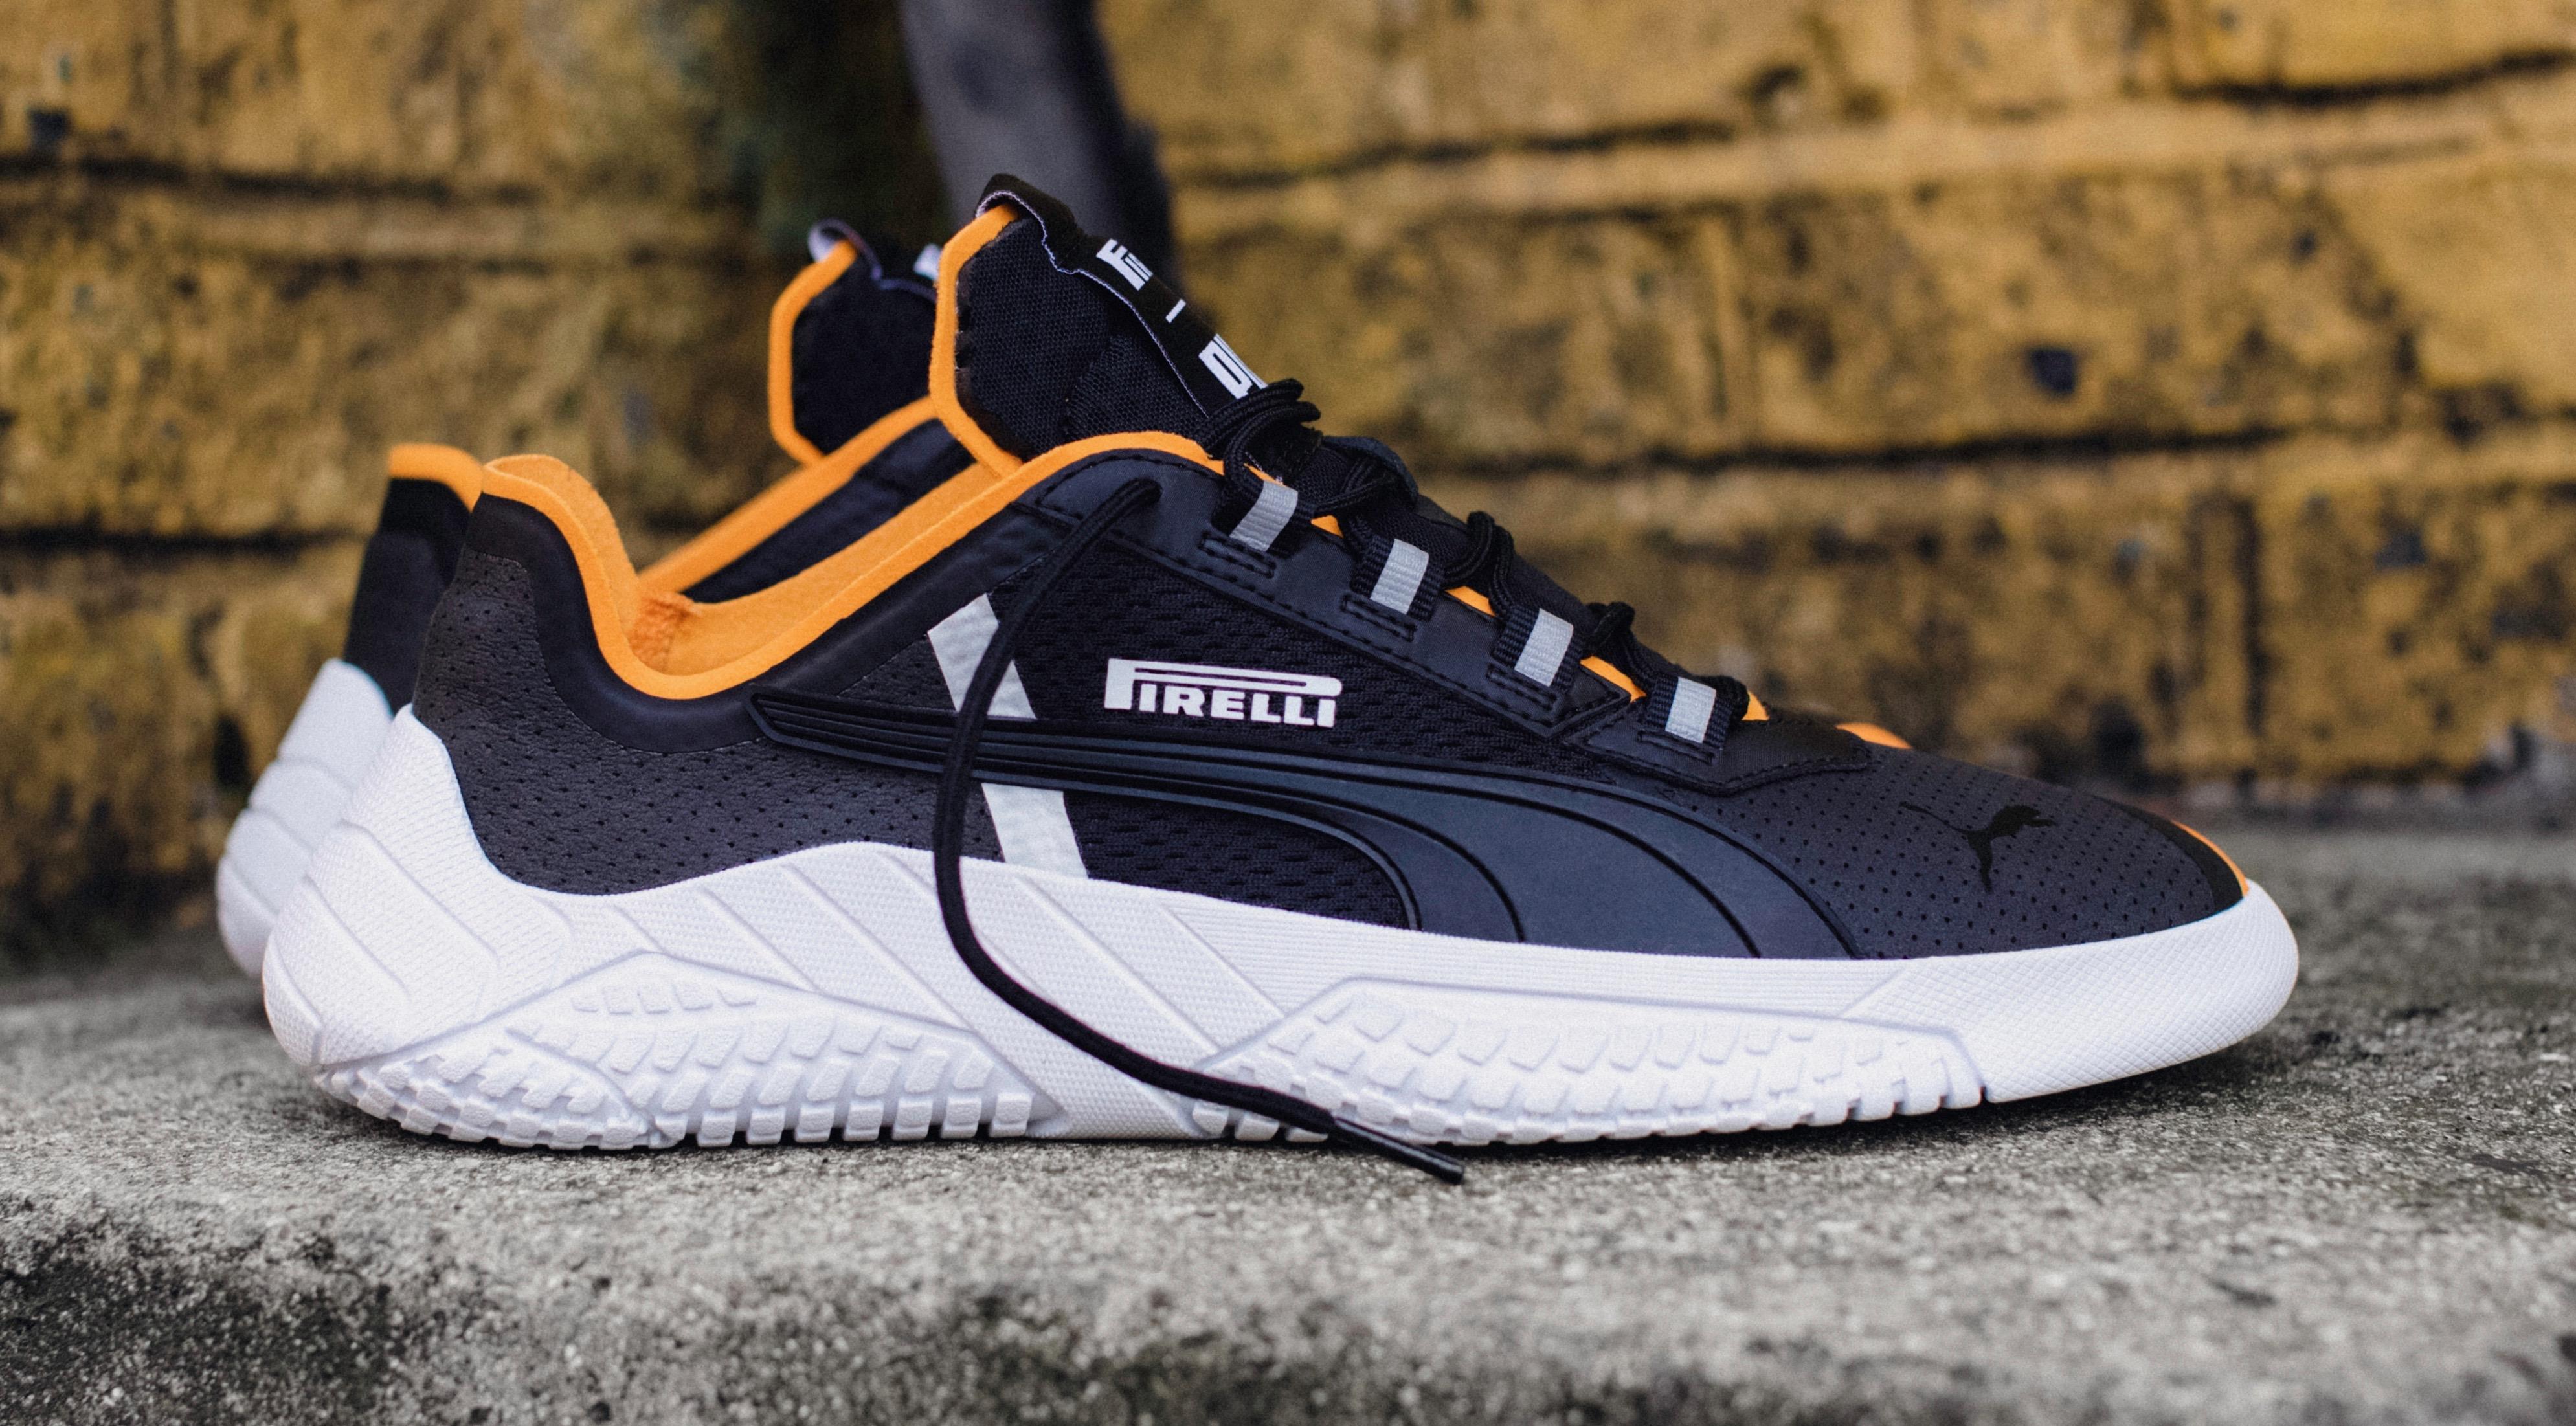 Pirelli, Puma launch motorsports style shoe, the Replicat X